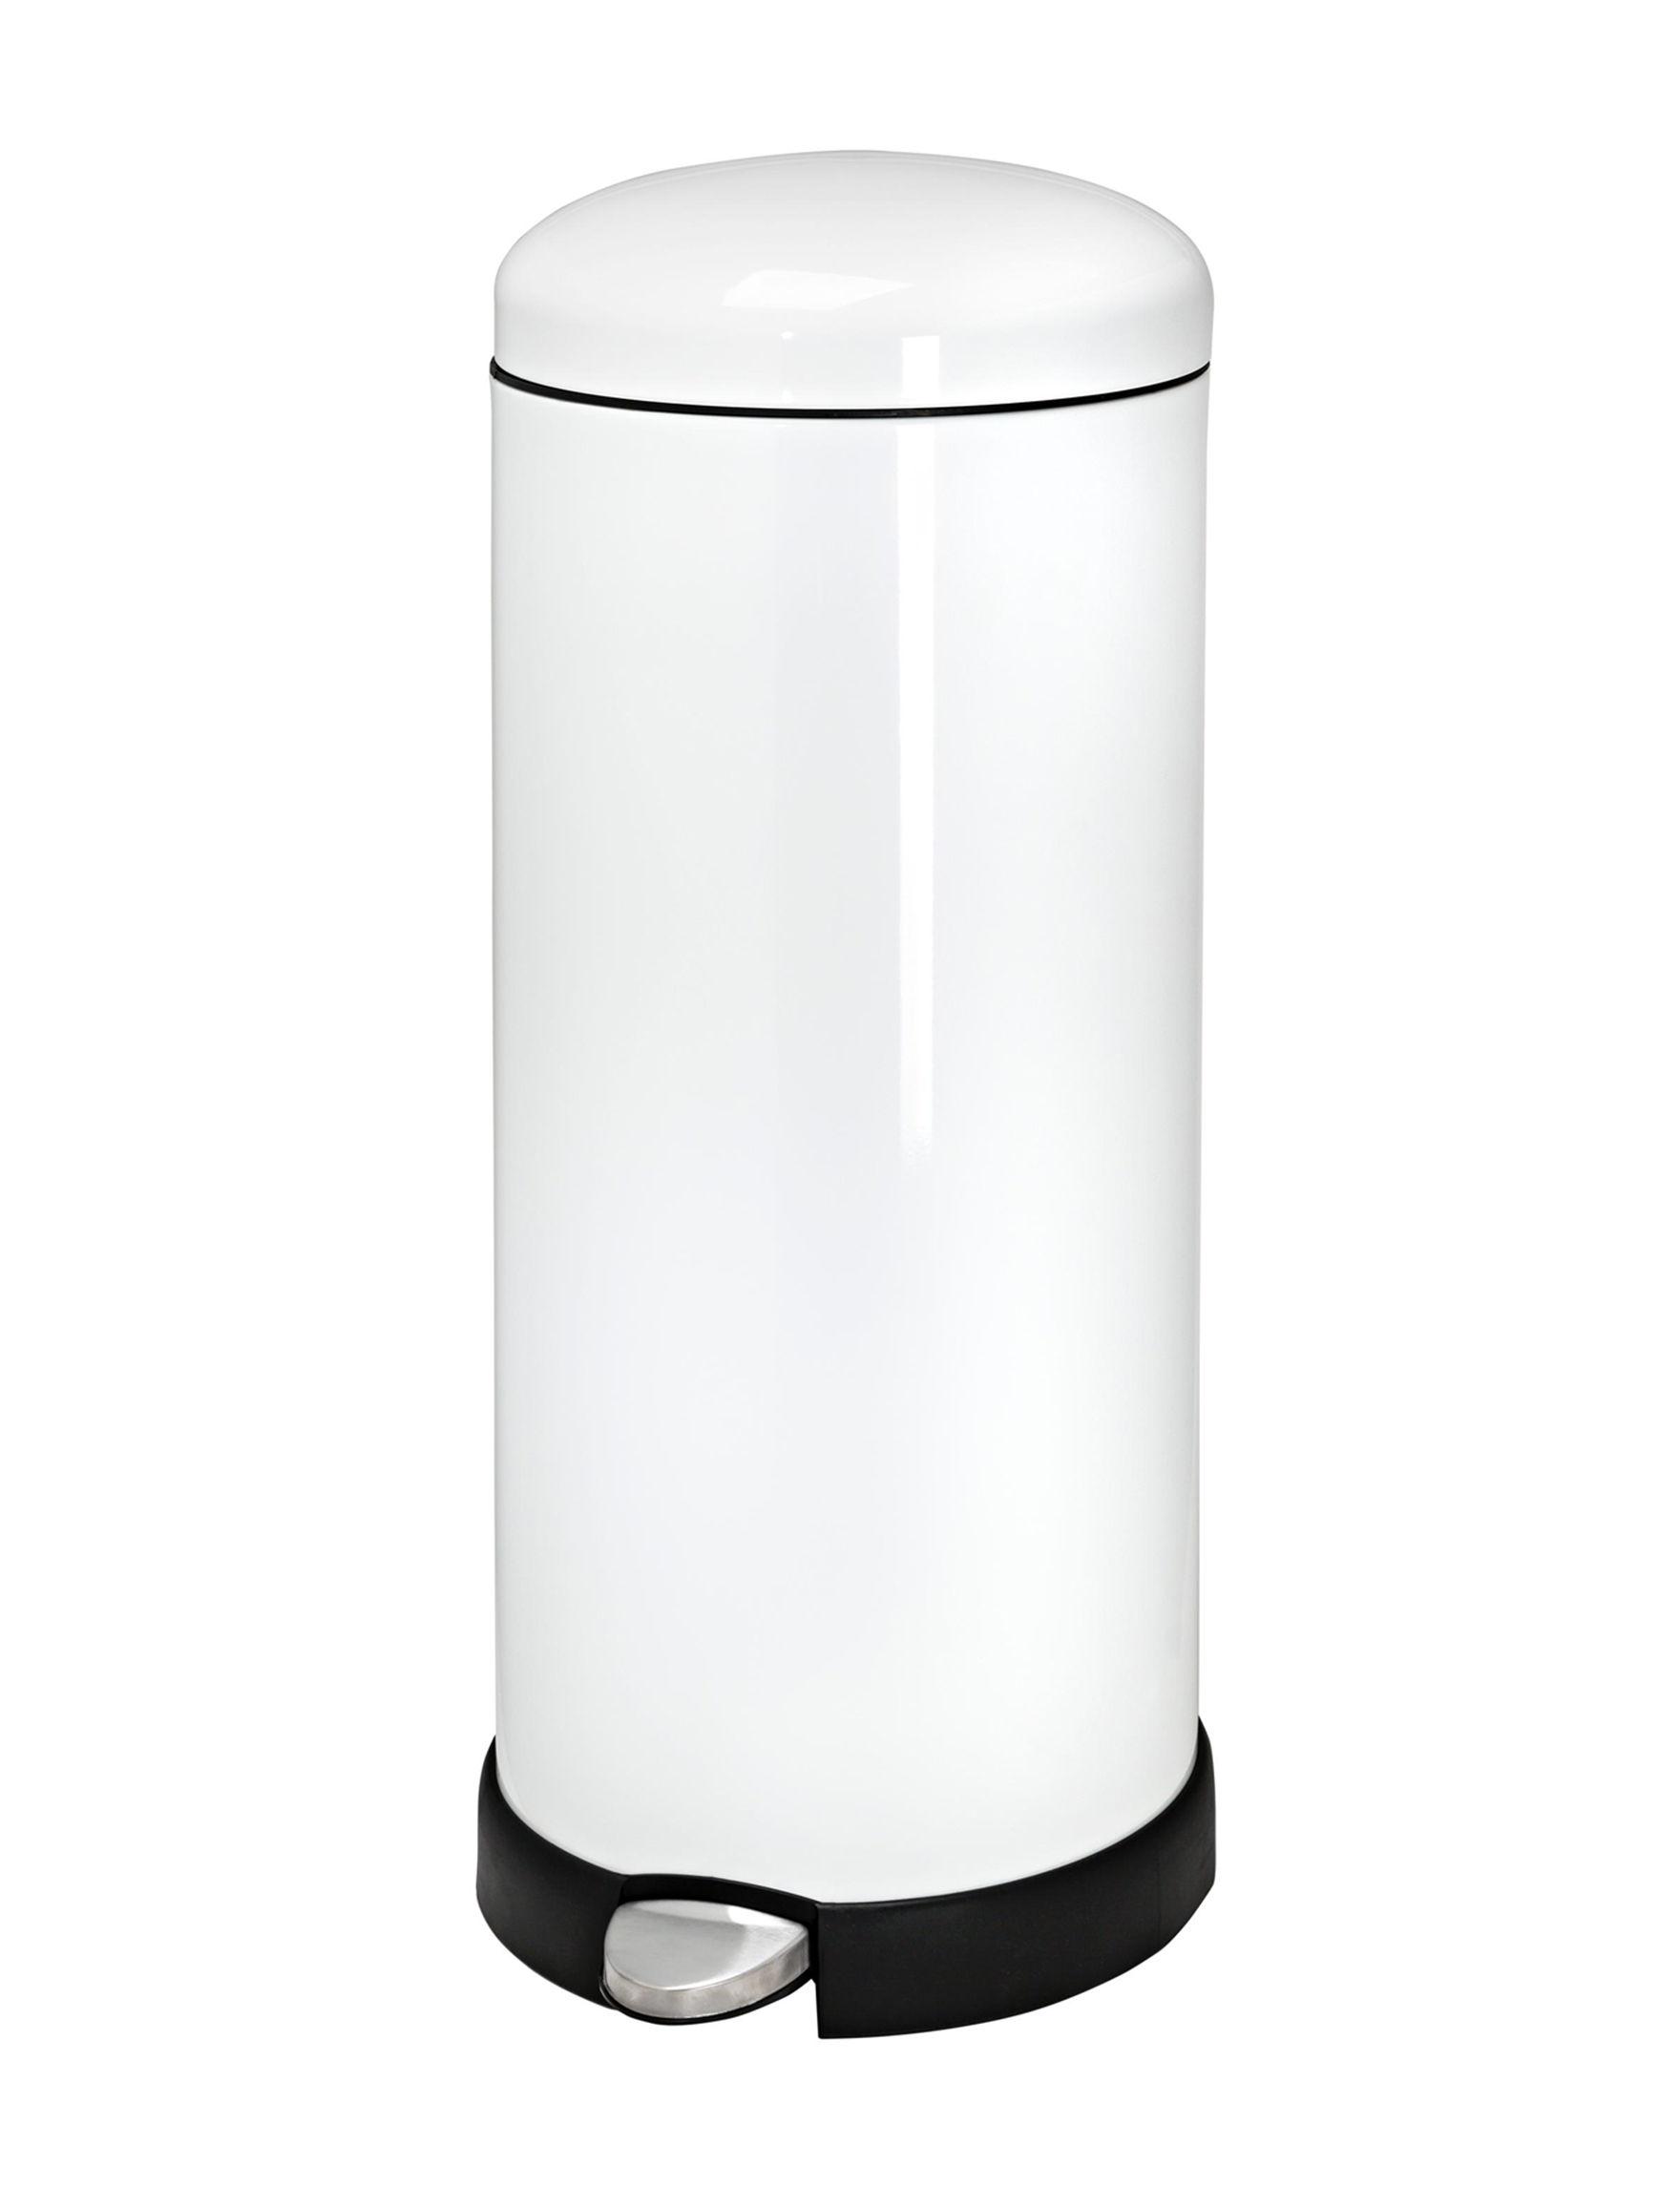 Honey-Can-Do International White Wastebaskets Storage & Organization